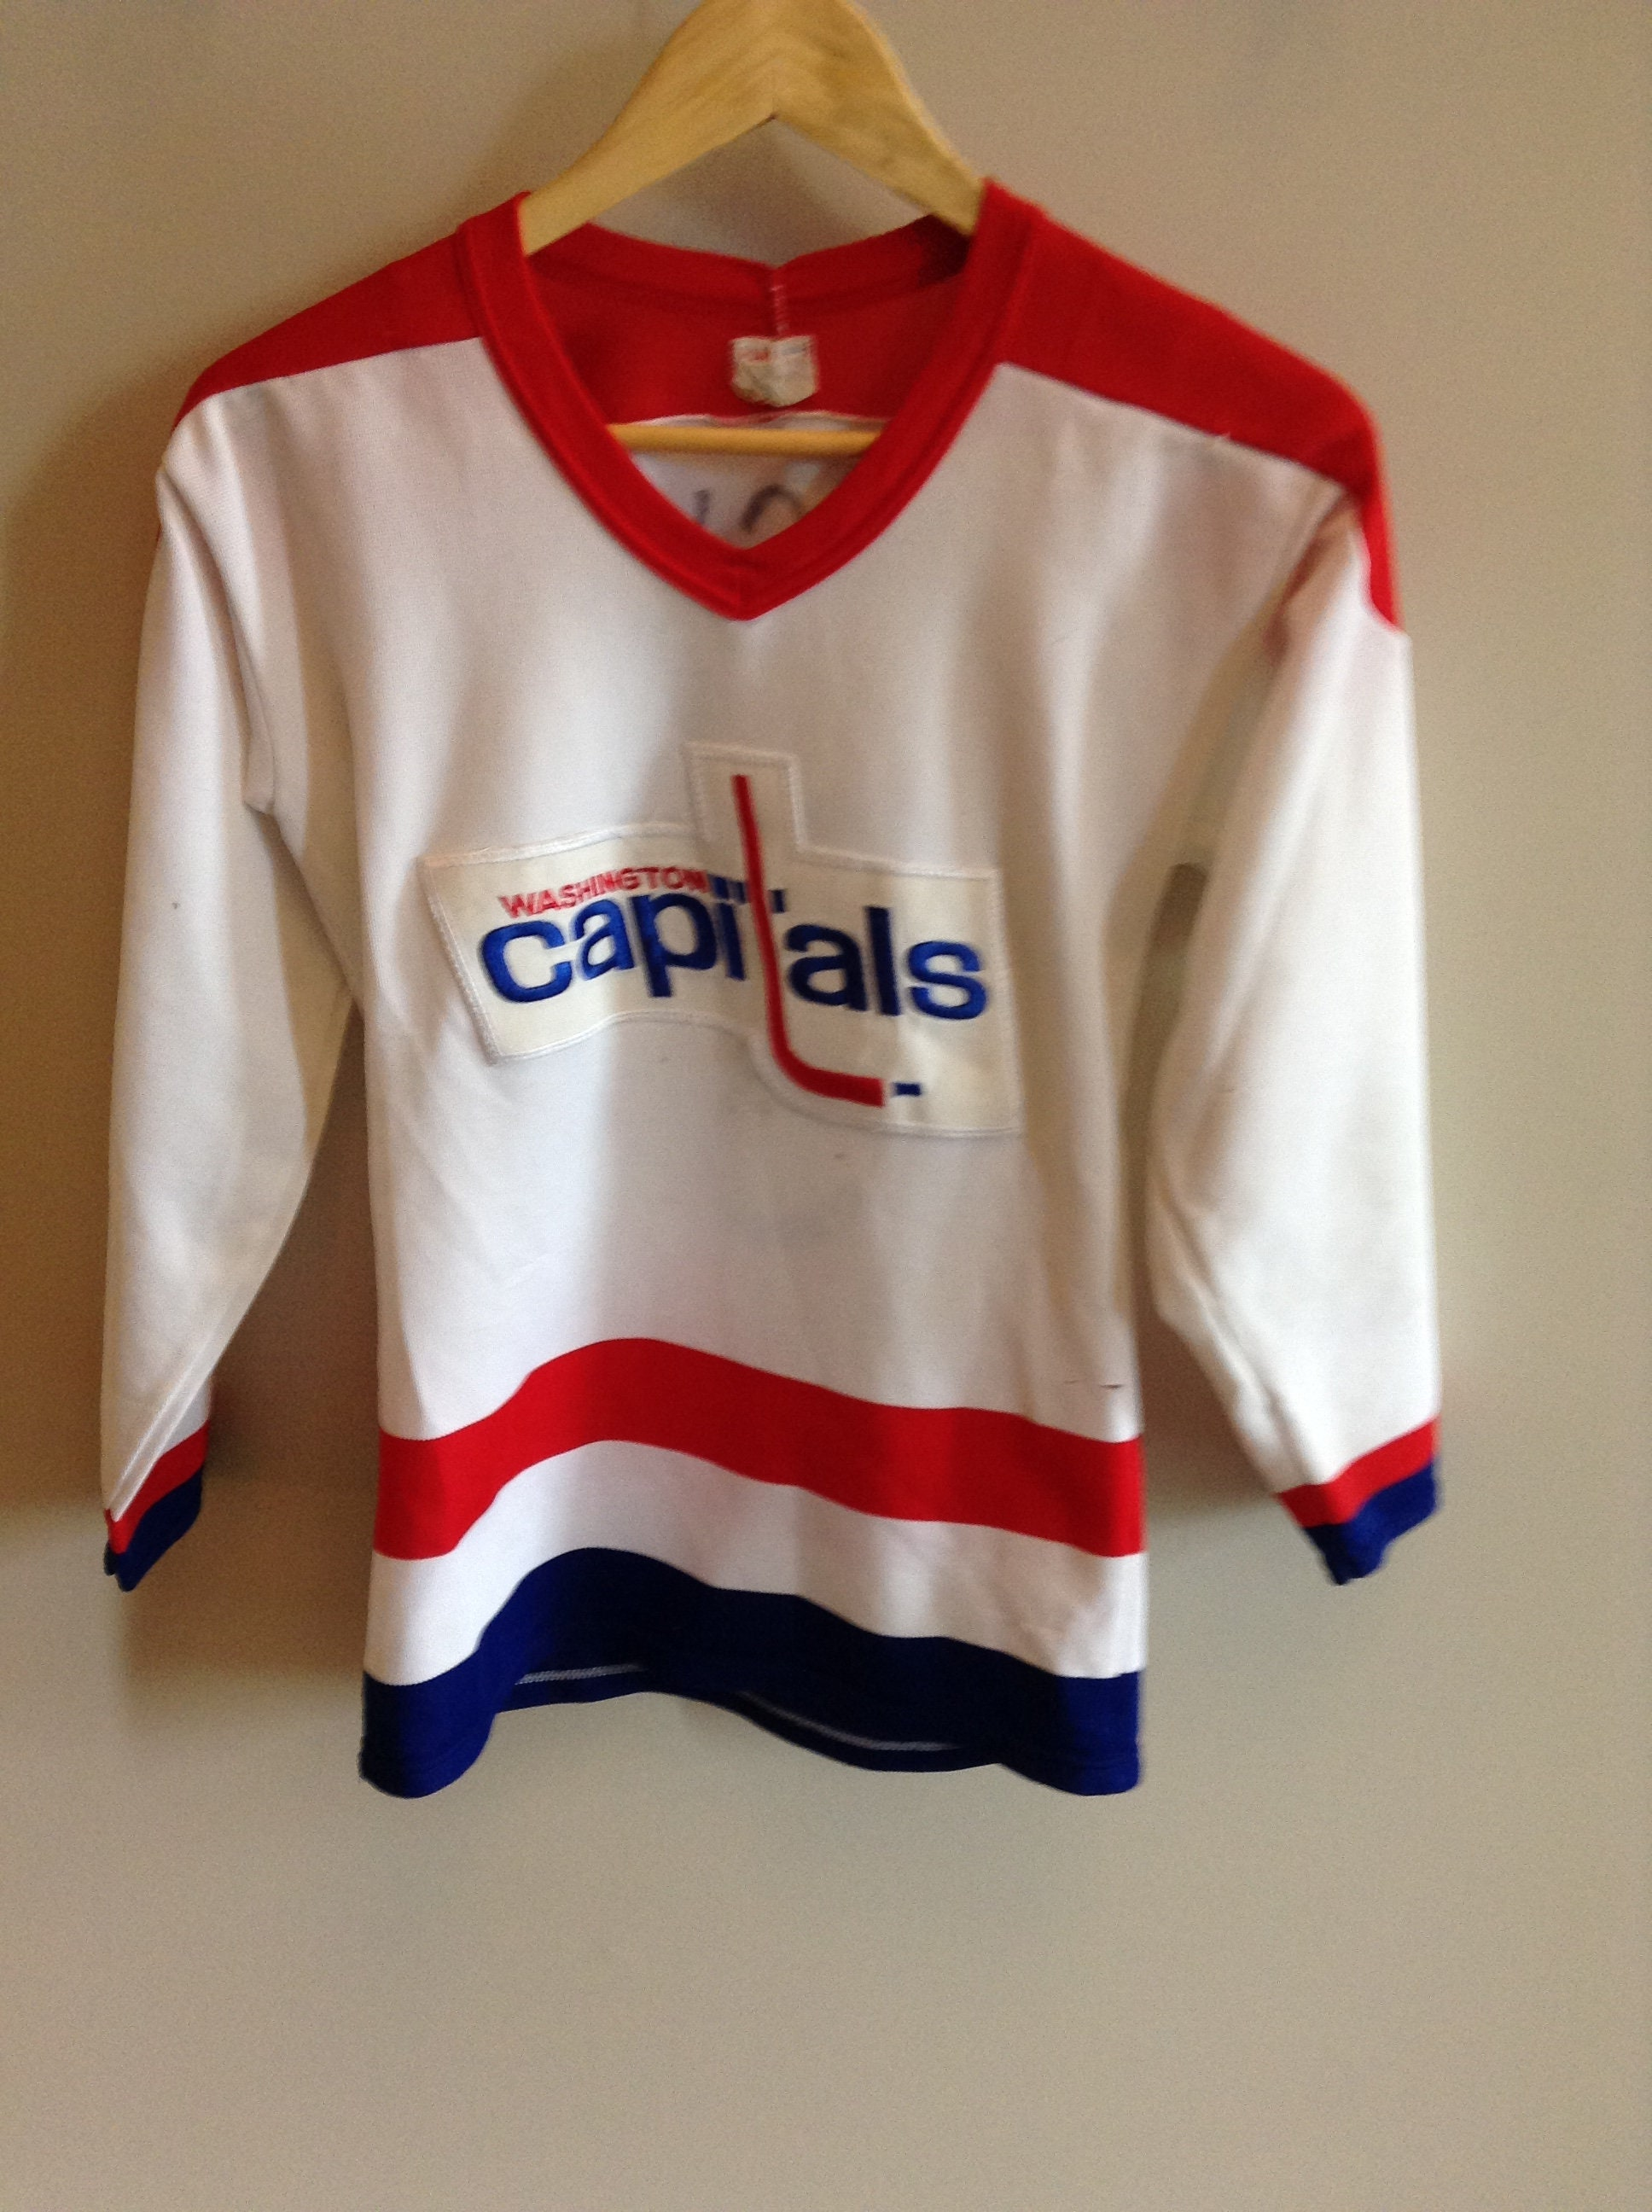 391aab0e Vintage Washington Capitals jersey - Boys XL - CCM by Maska - 80's - #5 Rod  Langway (handmade/drawn)